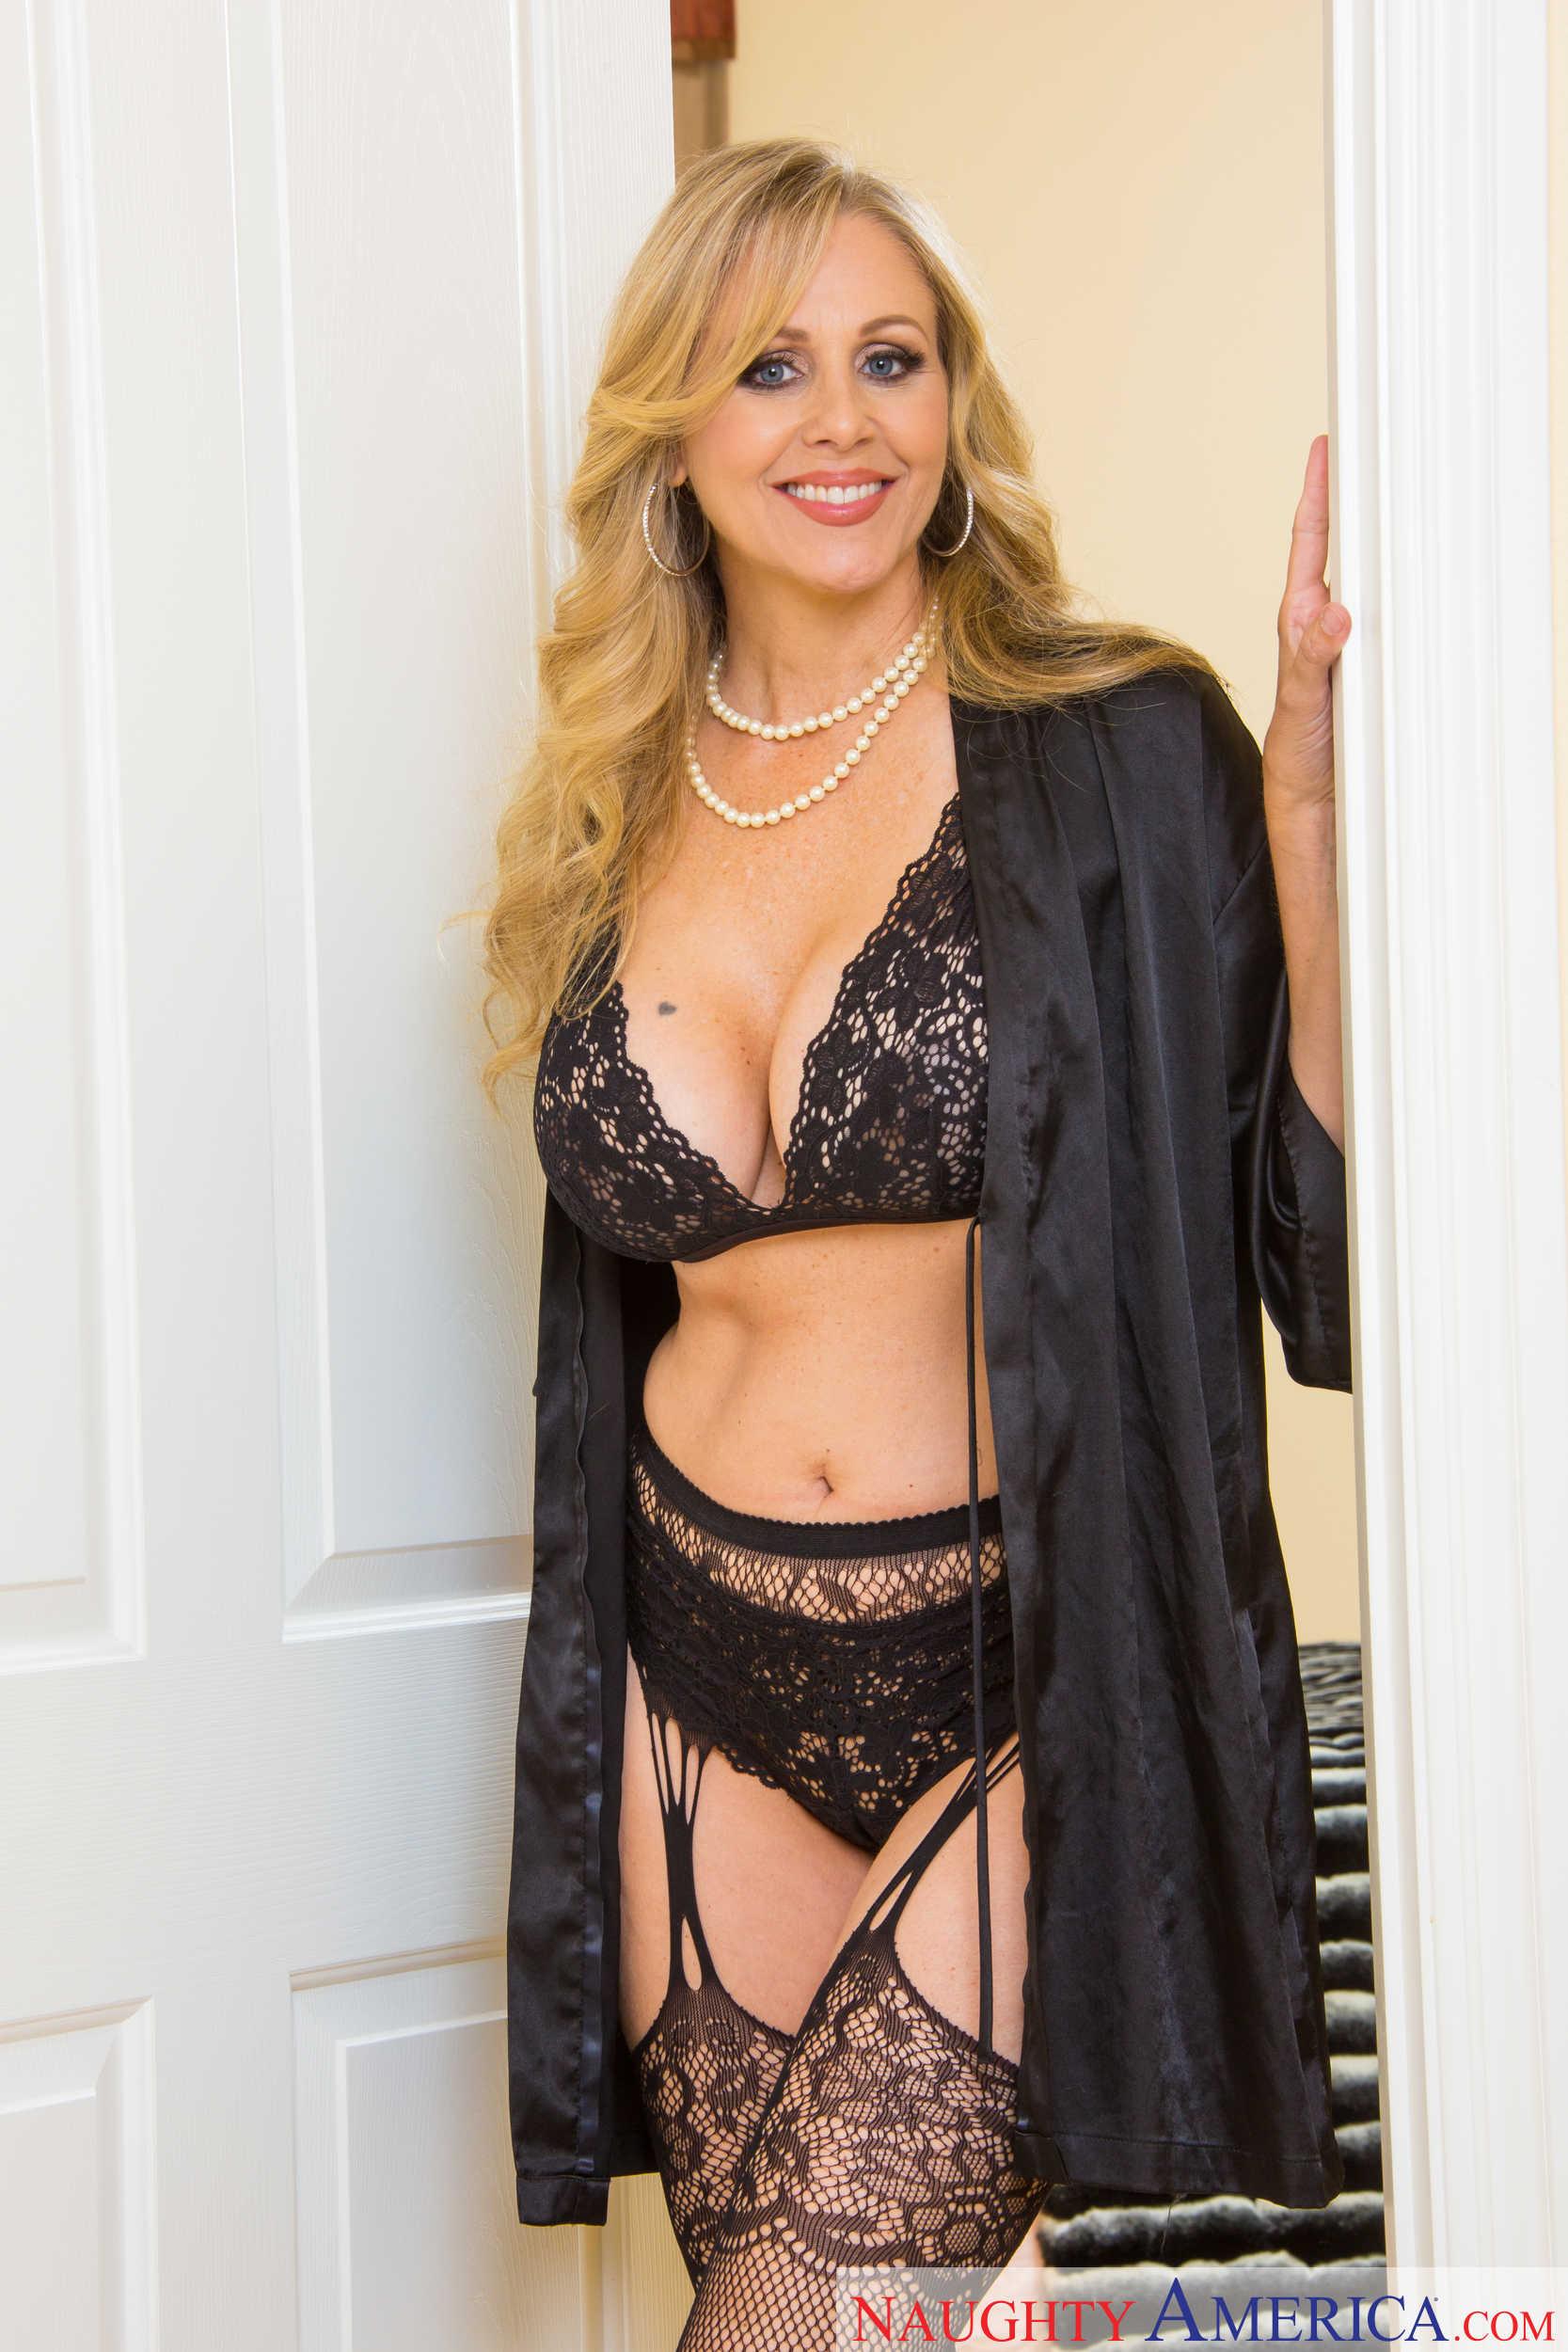 busty porn diva julia ann puts on her best black lingerie, net